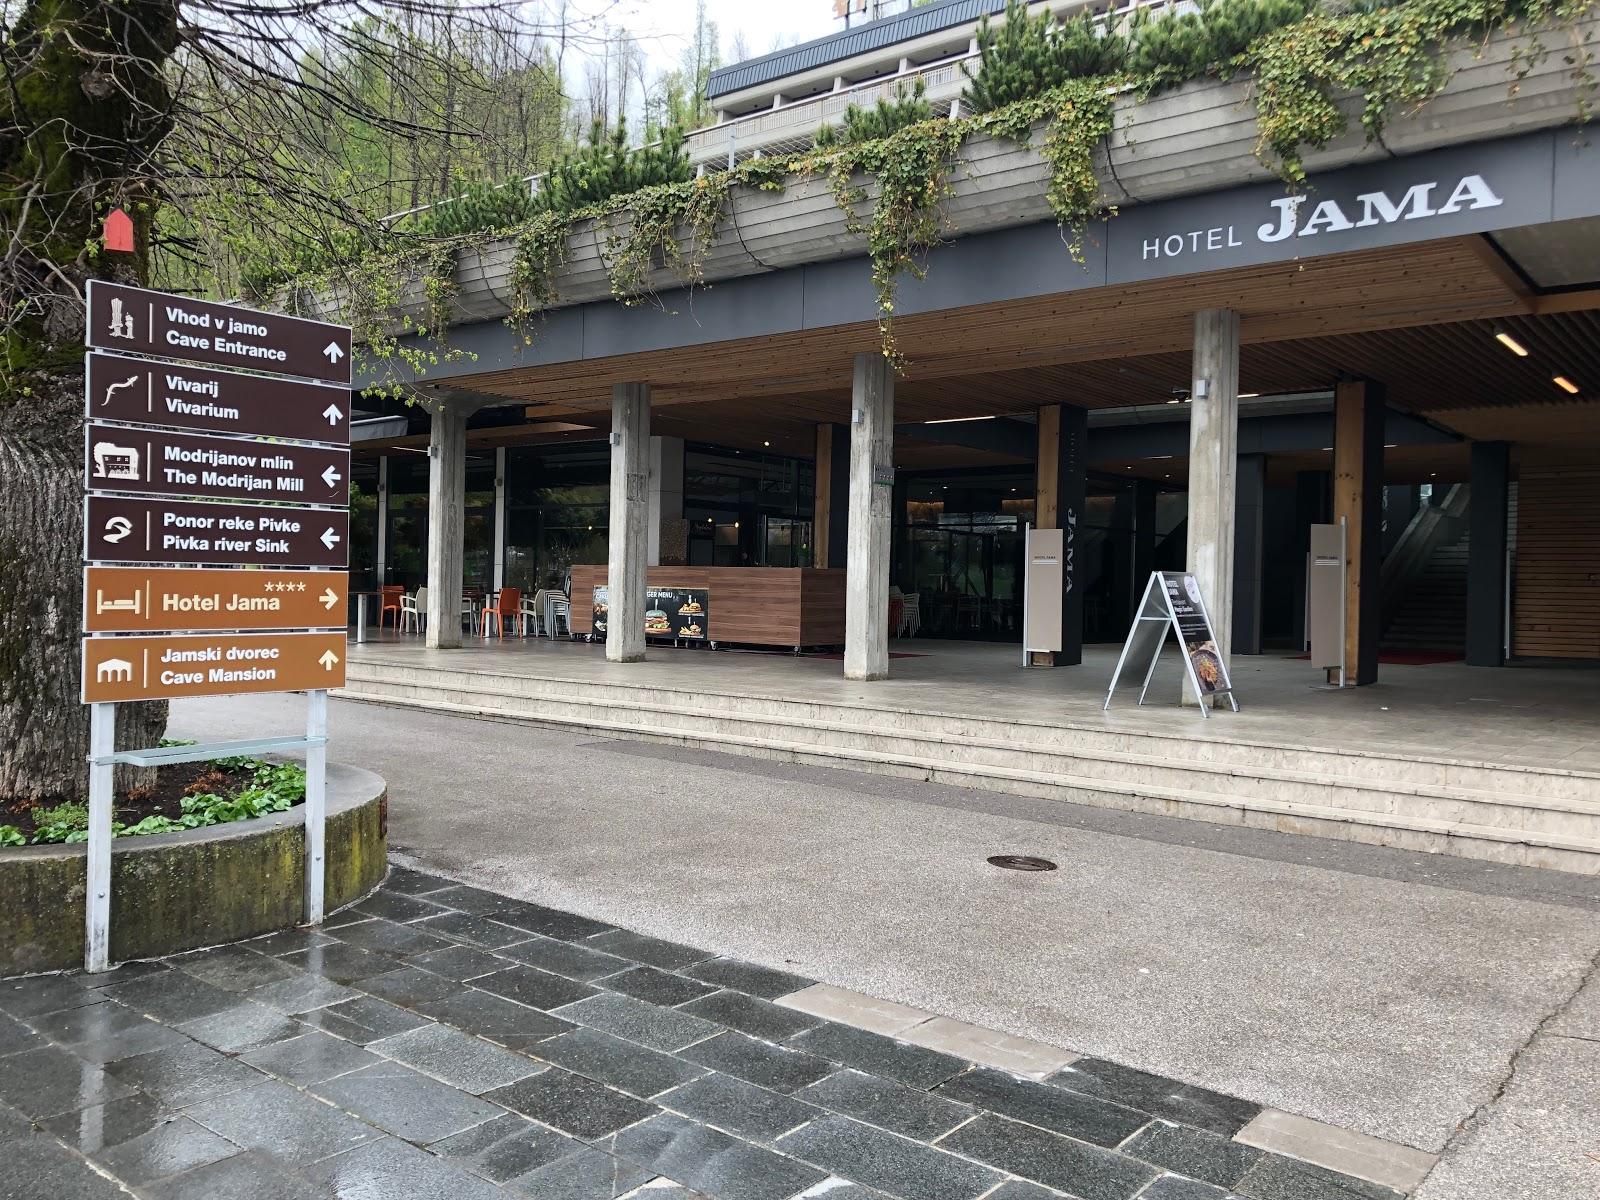 Hotel Jama next to the Postojna cave